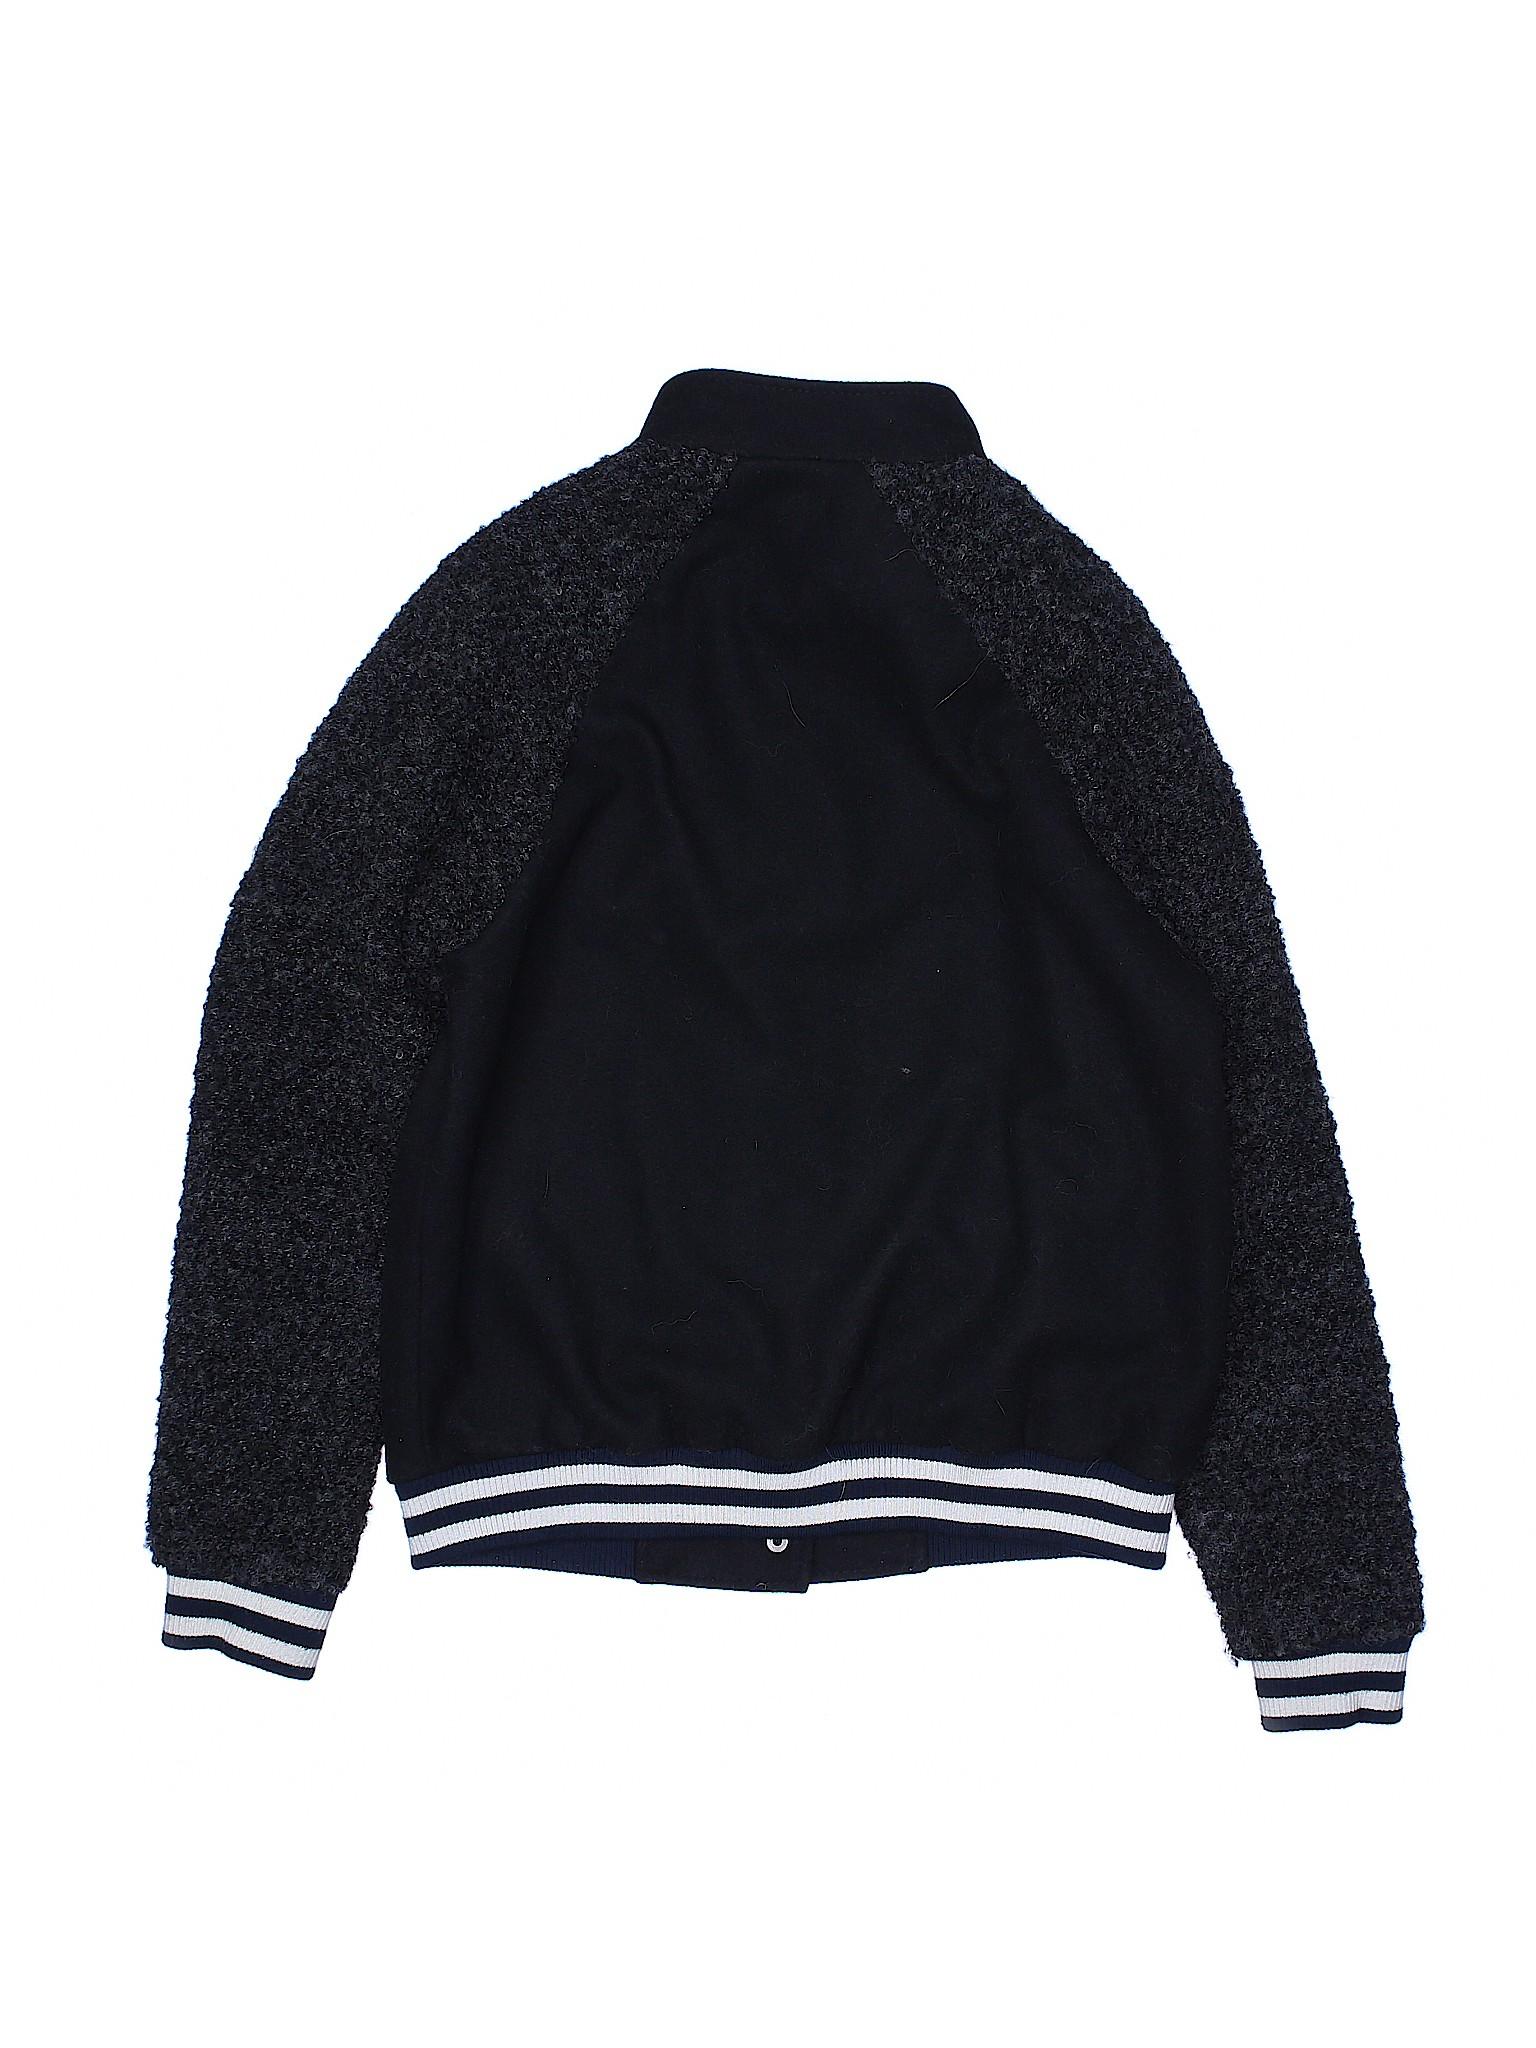 Coat 21 Forever Winter Wool Leisure fwzT0x